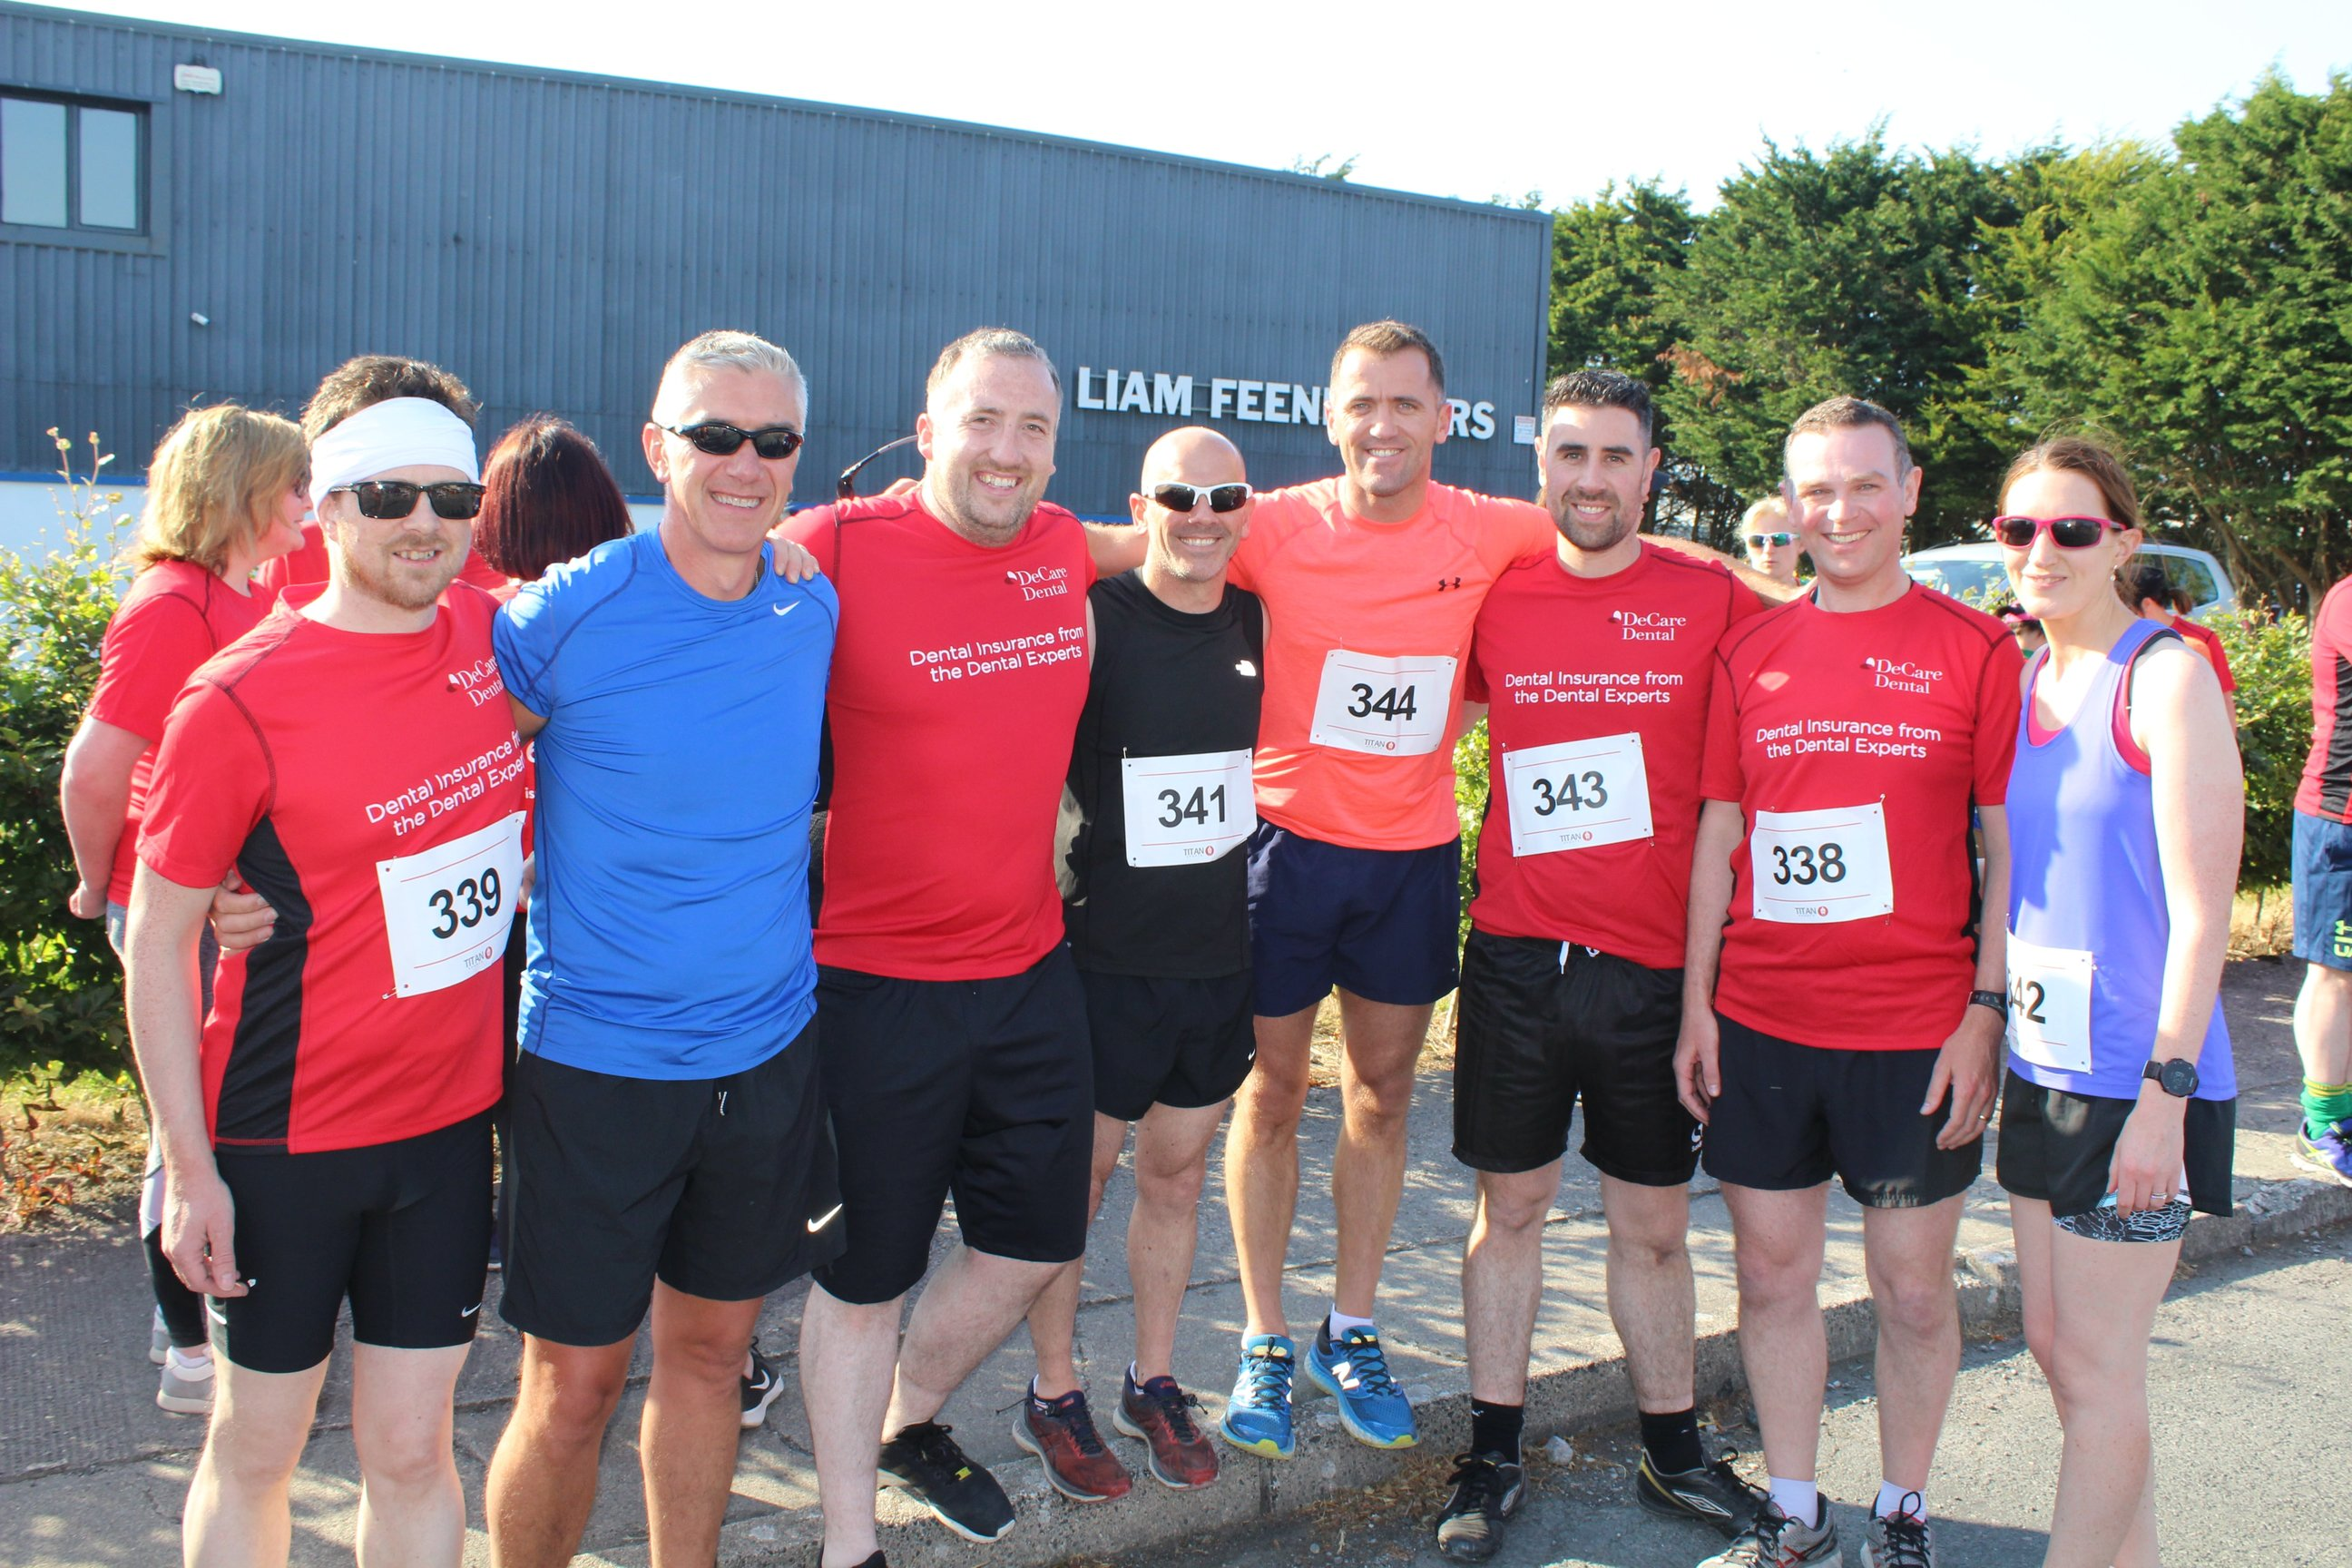 CBE Team at the 5k fun run